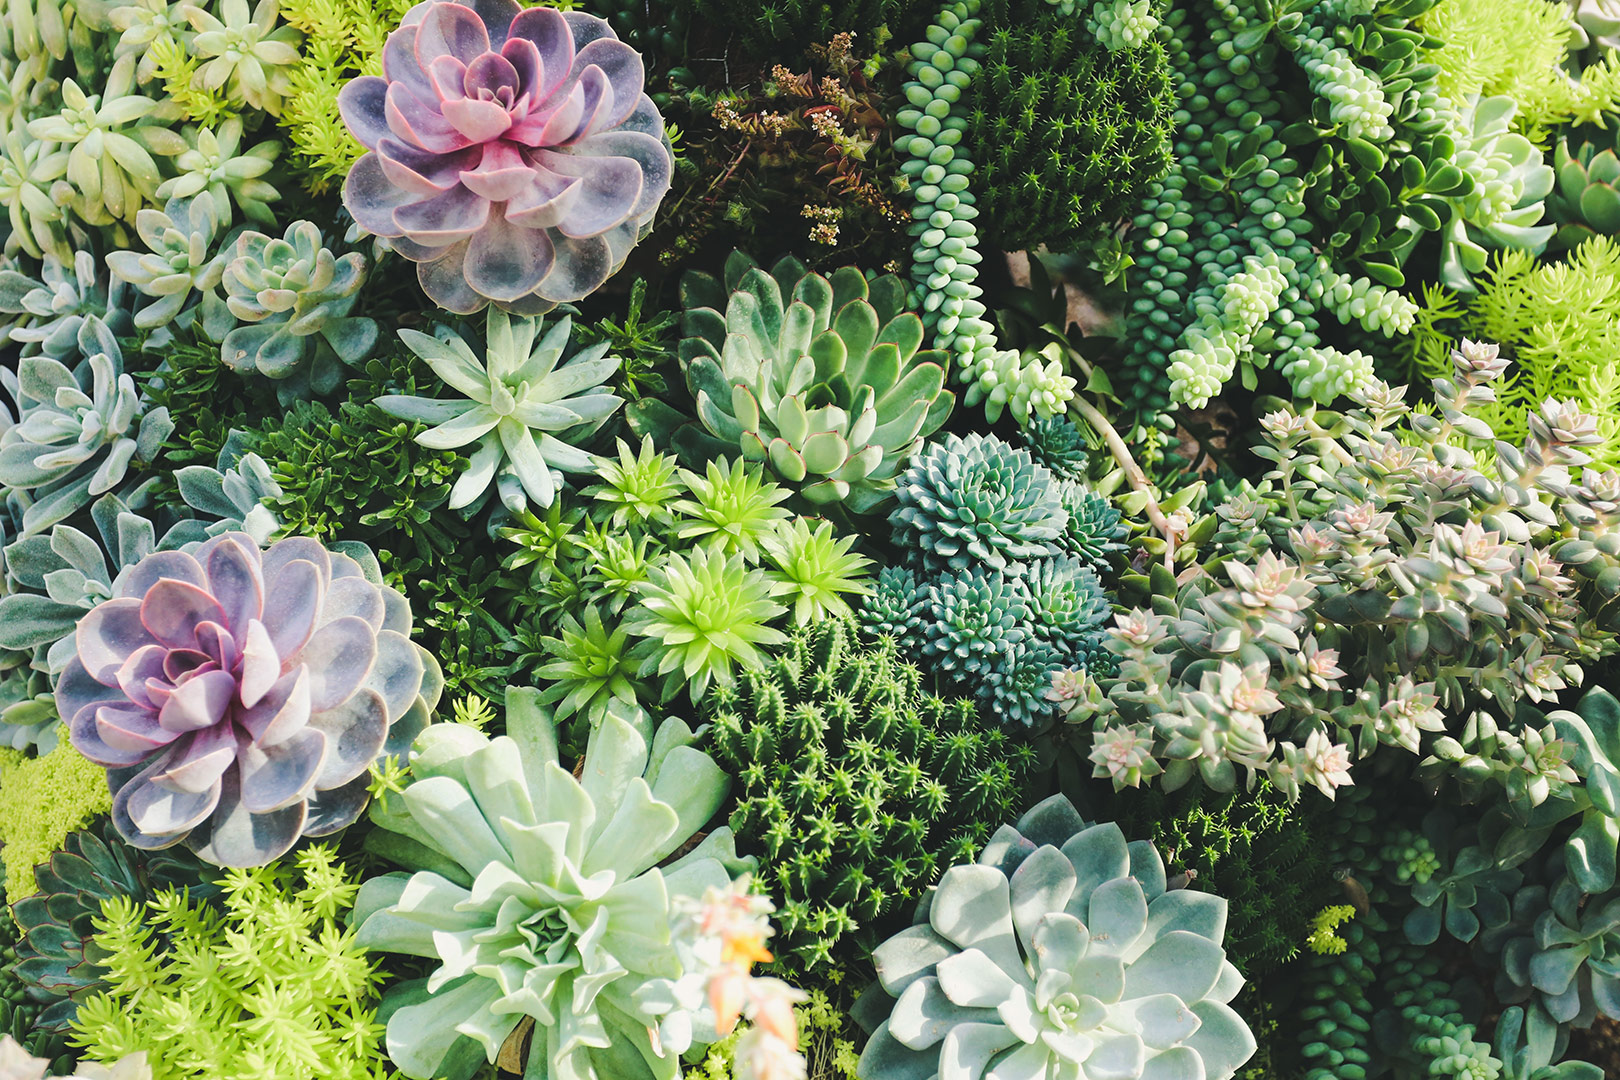 image-of-green-garden-plants